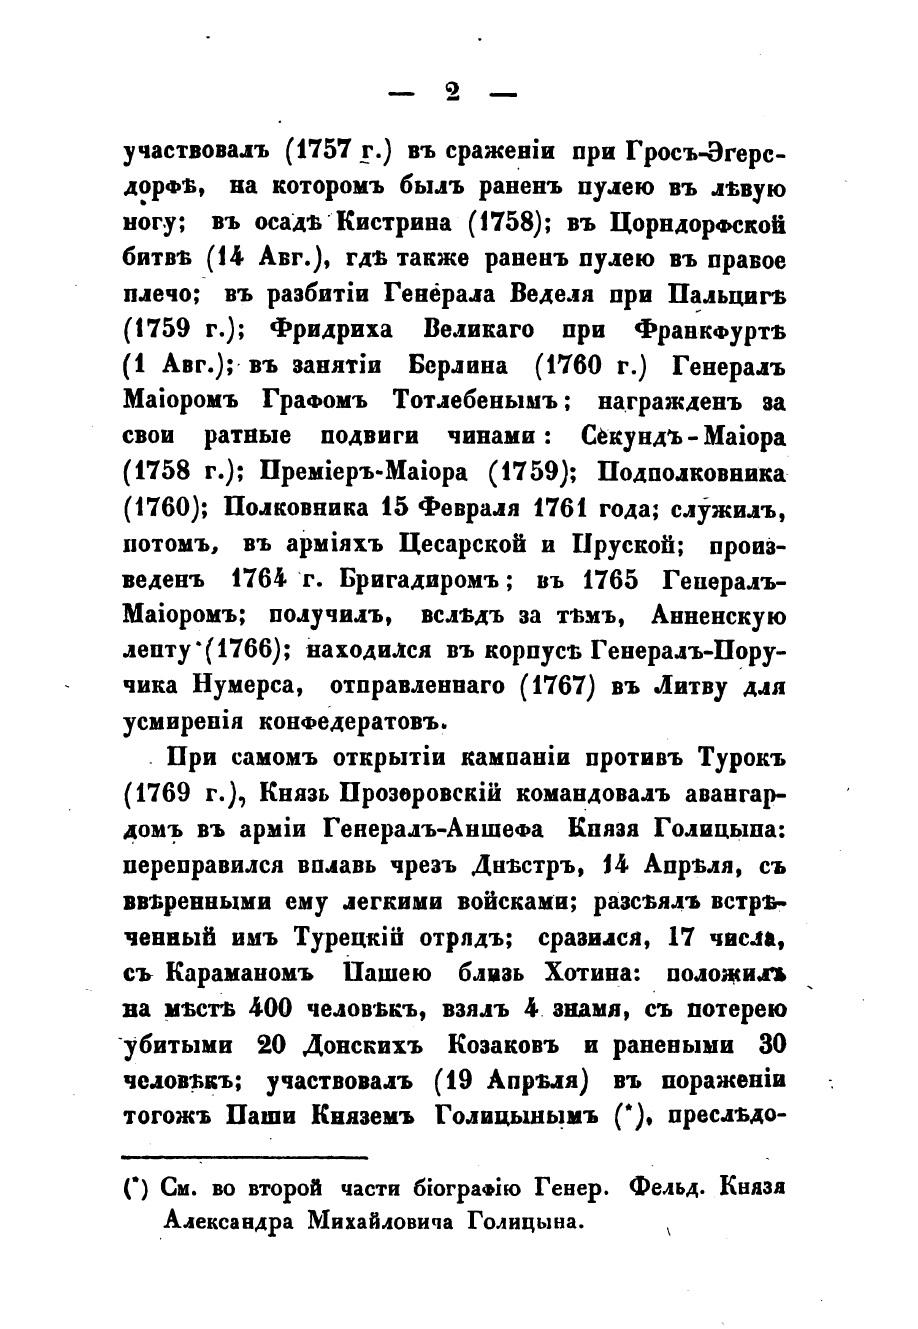 http://i2.imageban.ru/out/2014/03/11/bb5c9354bb053a6e1f6fe1621359419e.jpg